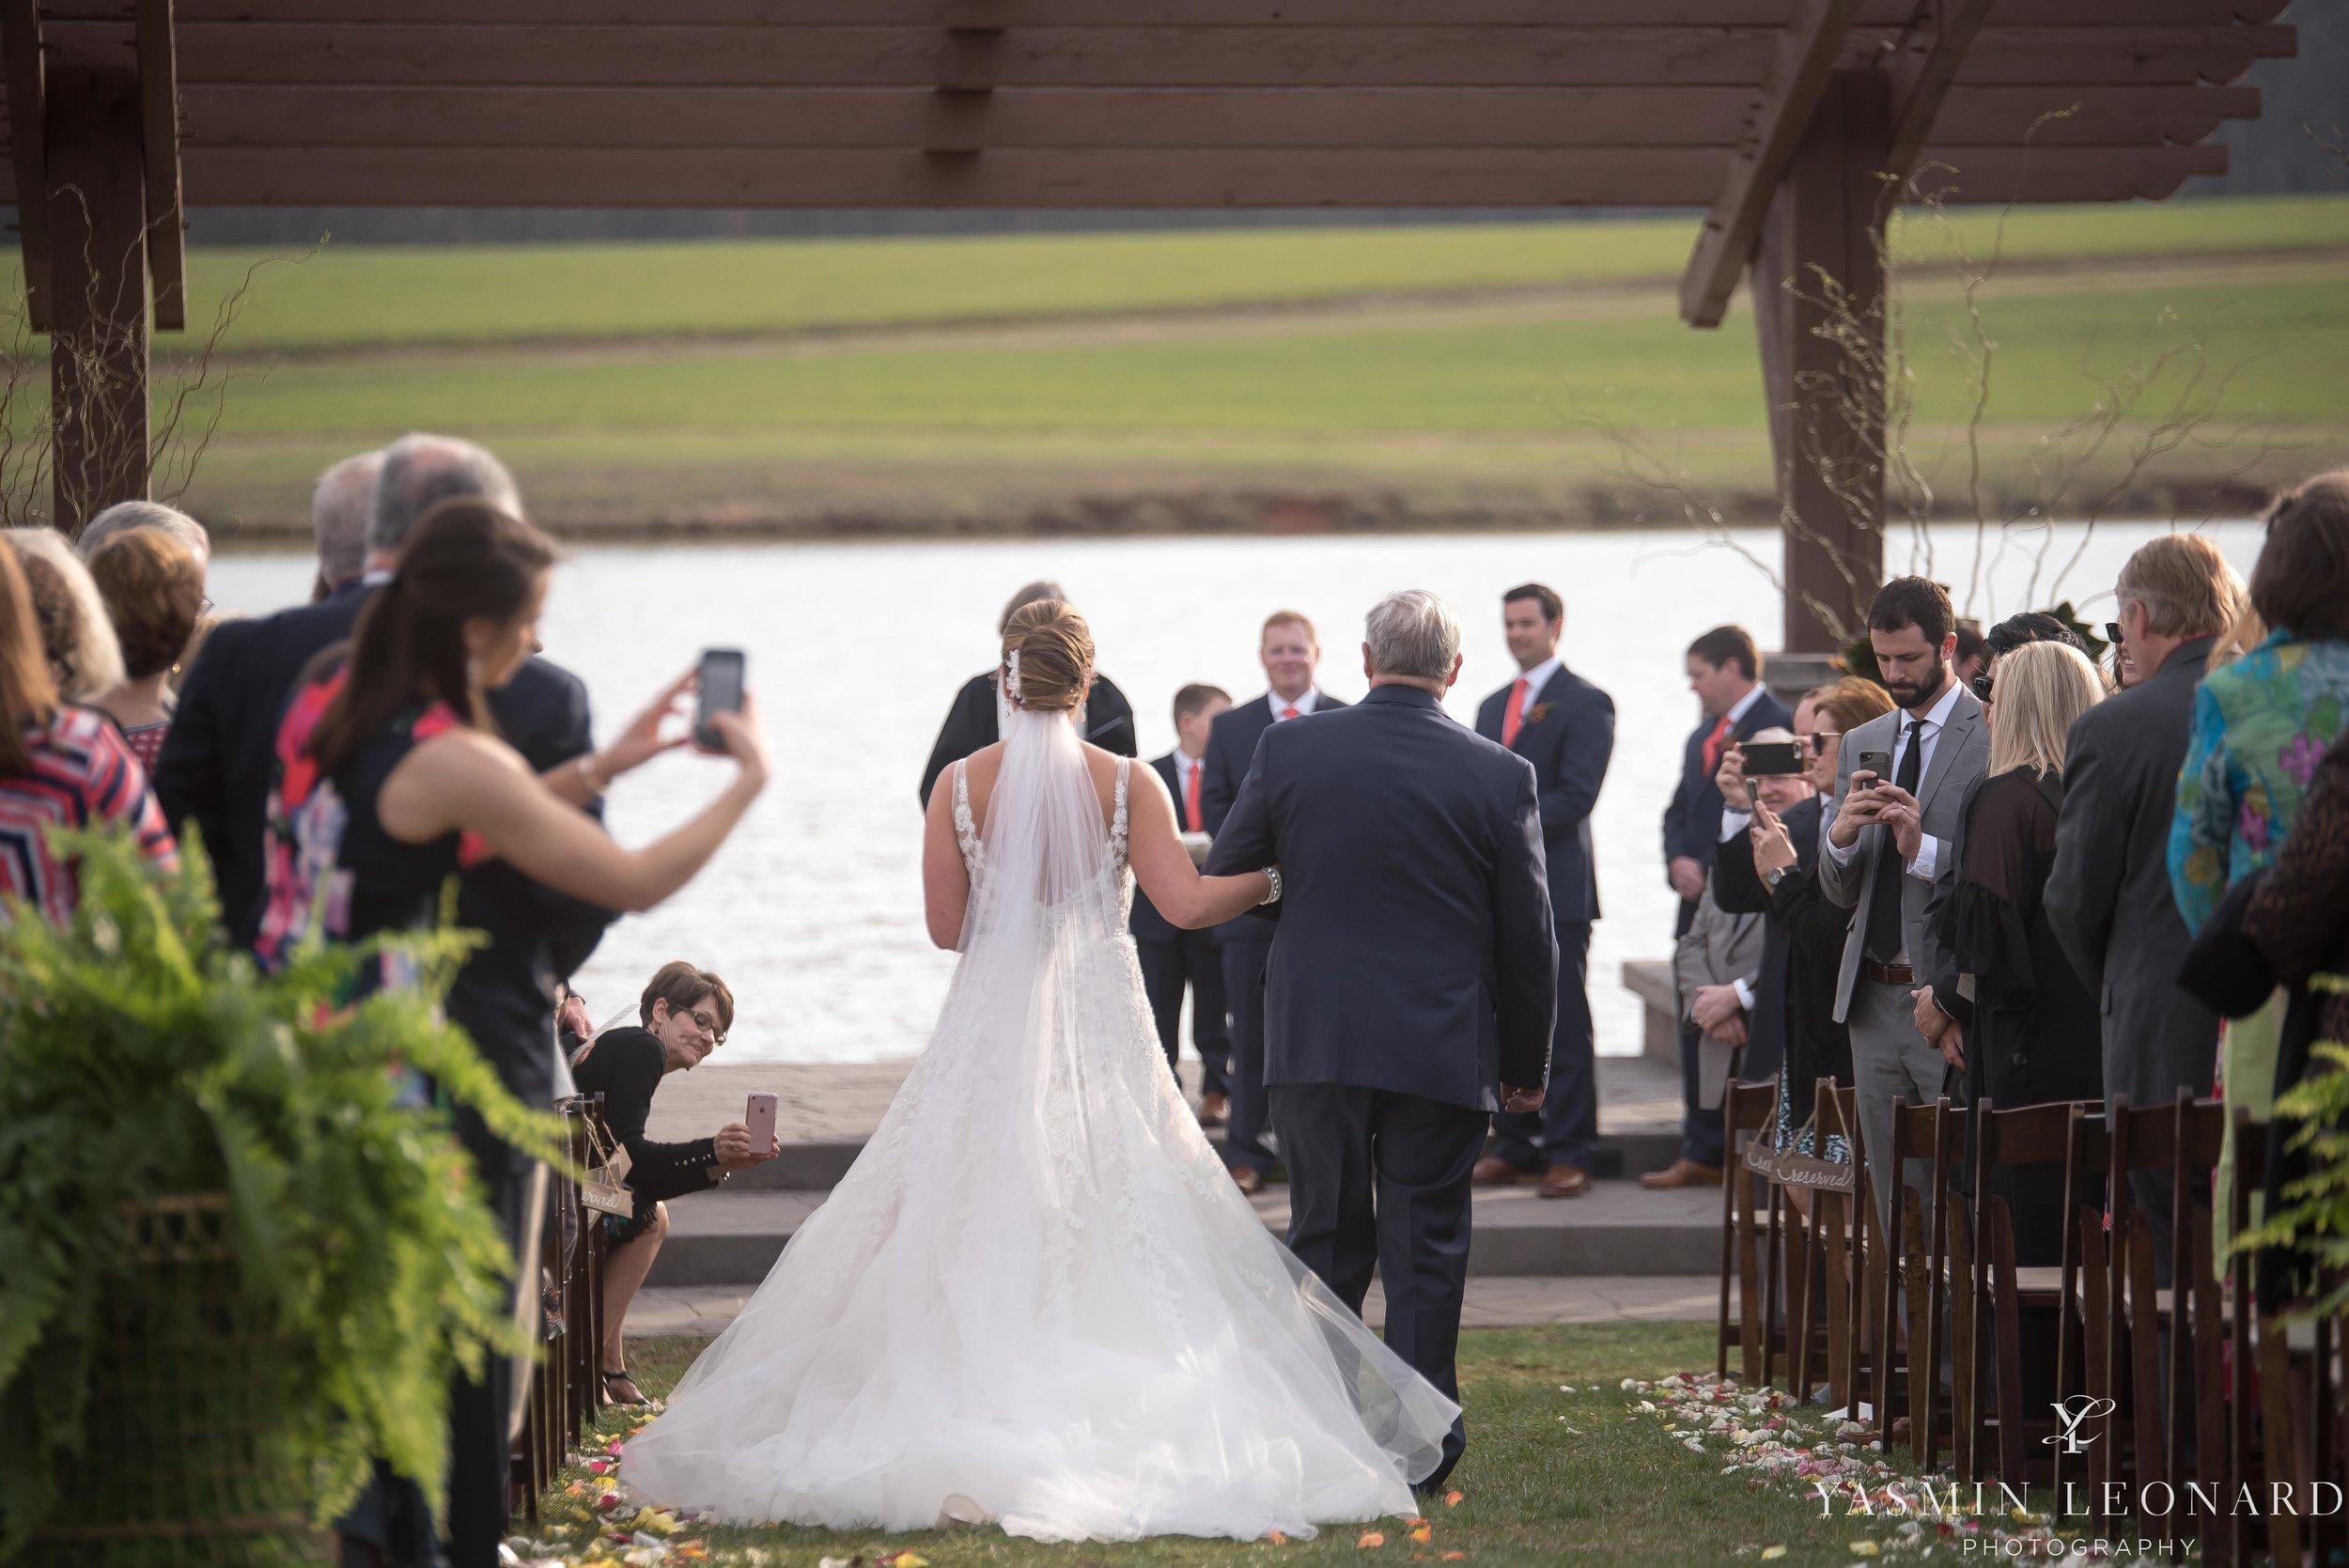 Adaumont Farm - Adaumont Farm Weddings - Trinity Weddings - NC Weddings - Yasmin Leonard Photography-30.jpg